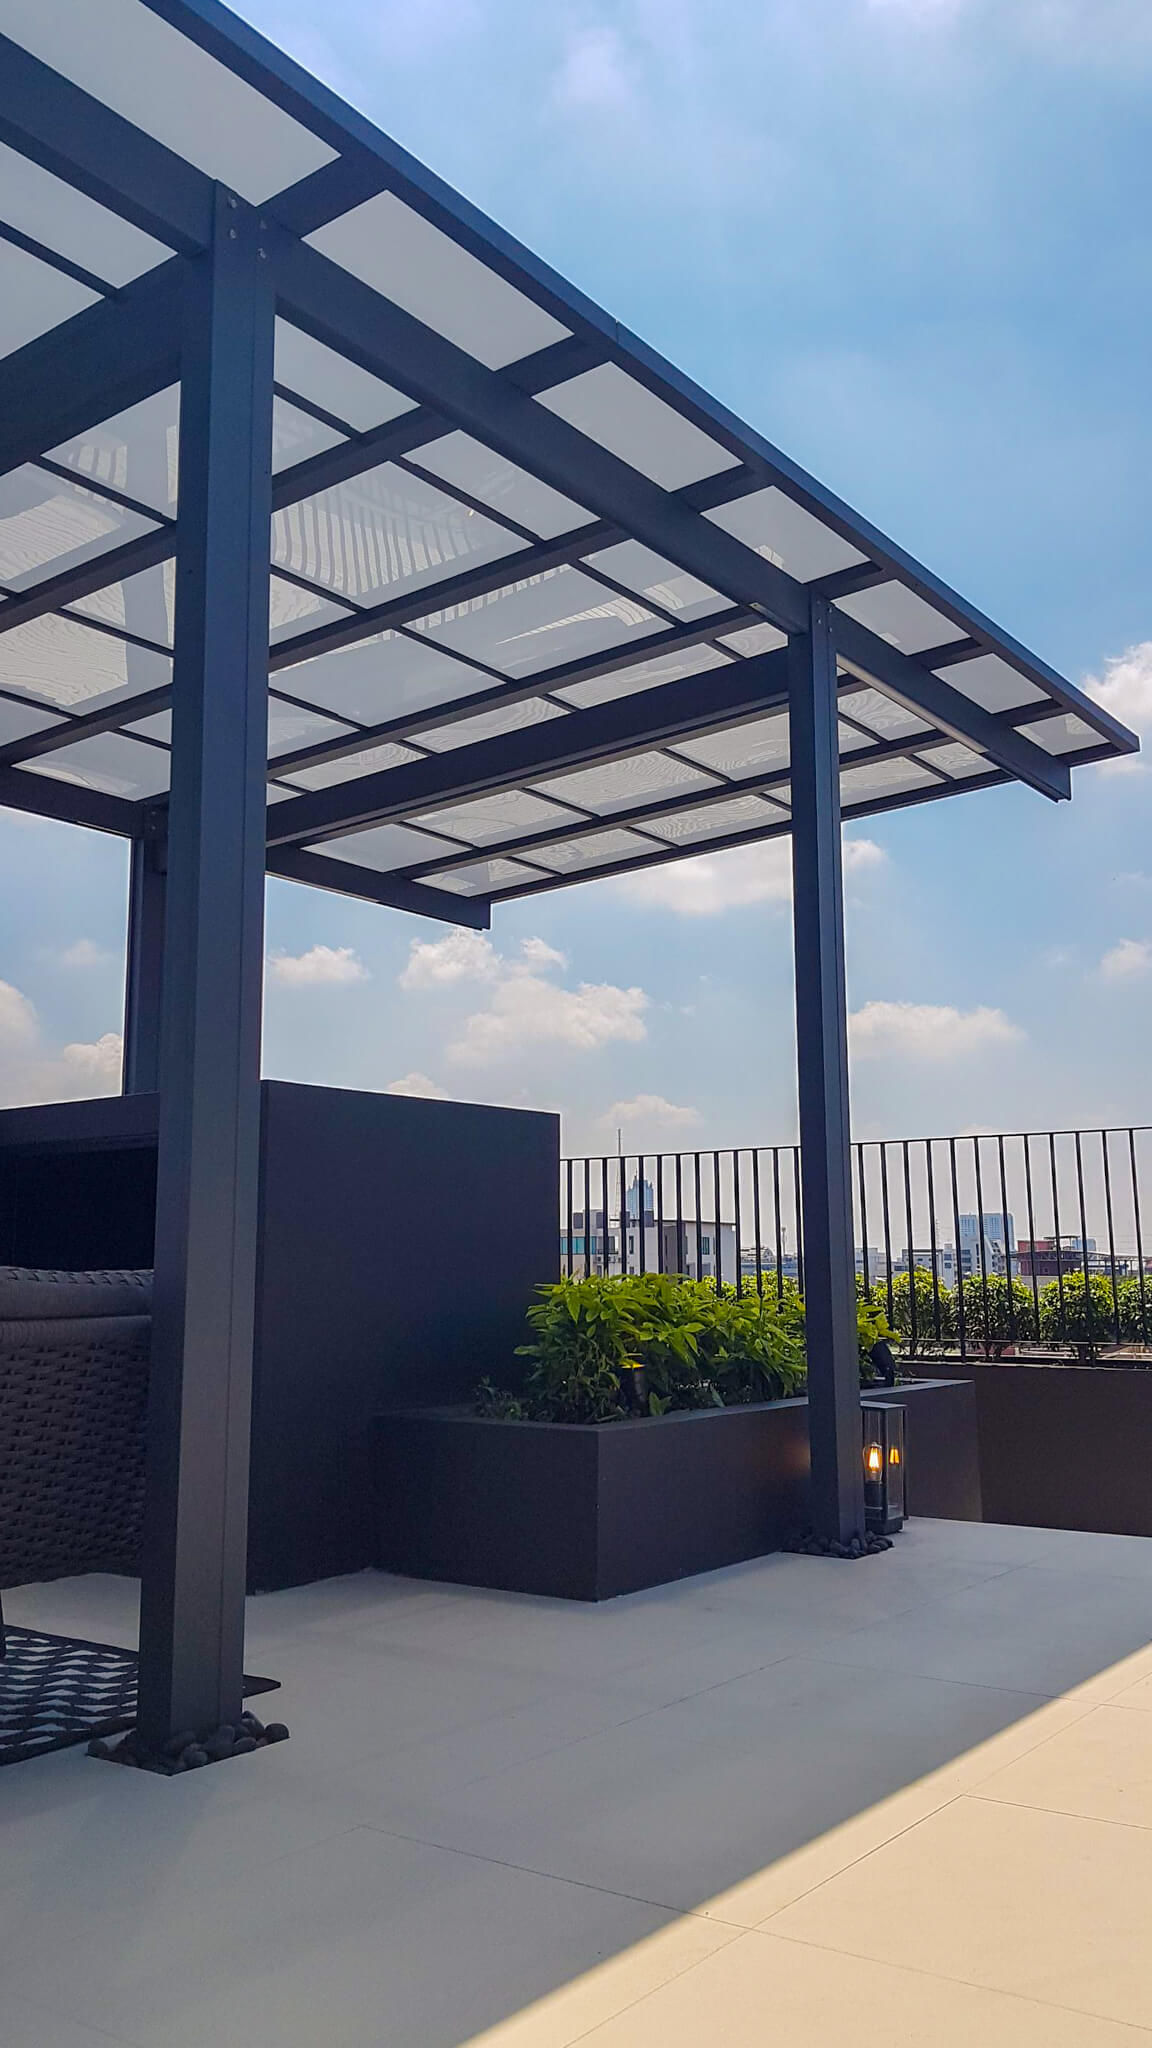 AIRES RAMA9 รีวิว Luxury Townhome 3.5 ชั้น + Rooftop ออกแบบสวย ย่านพระราม9 (ใกล้ รพ.สมิติเวช) 87 - AIRES